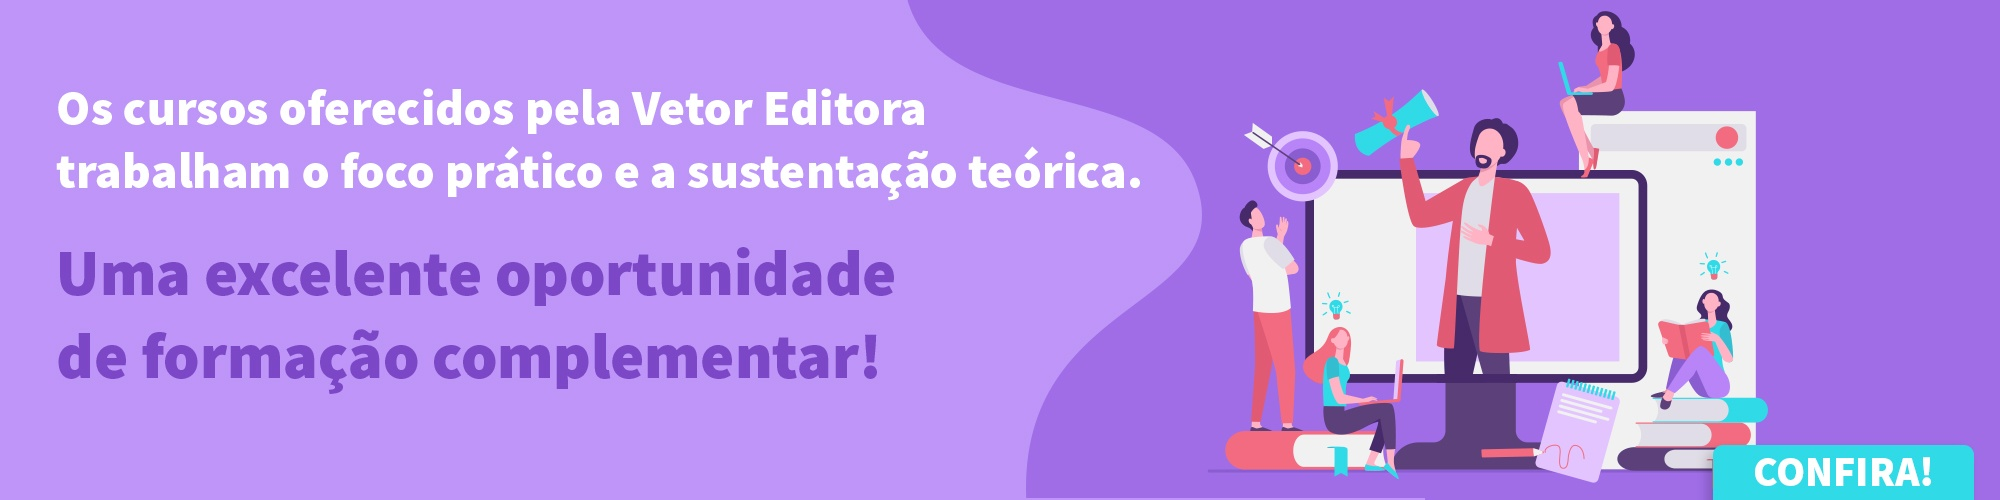 CURSOS VETOR EDITORA